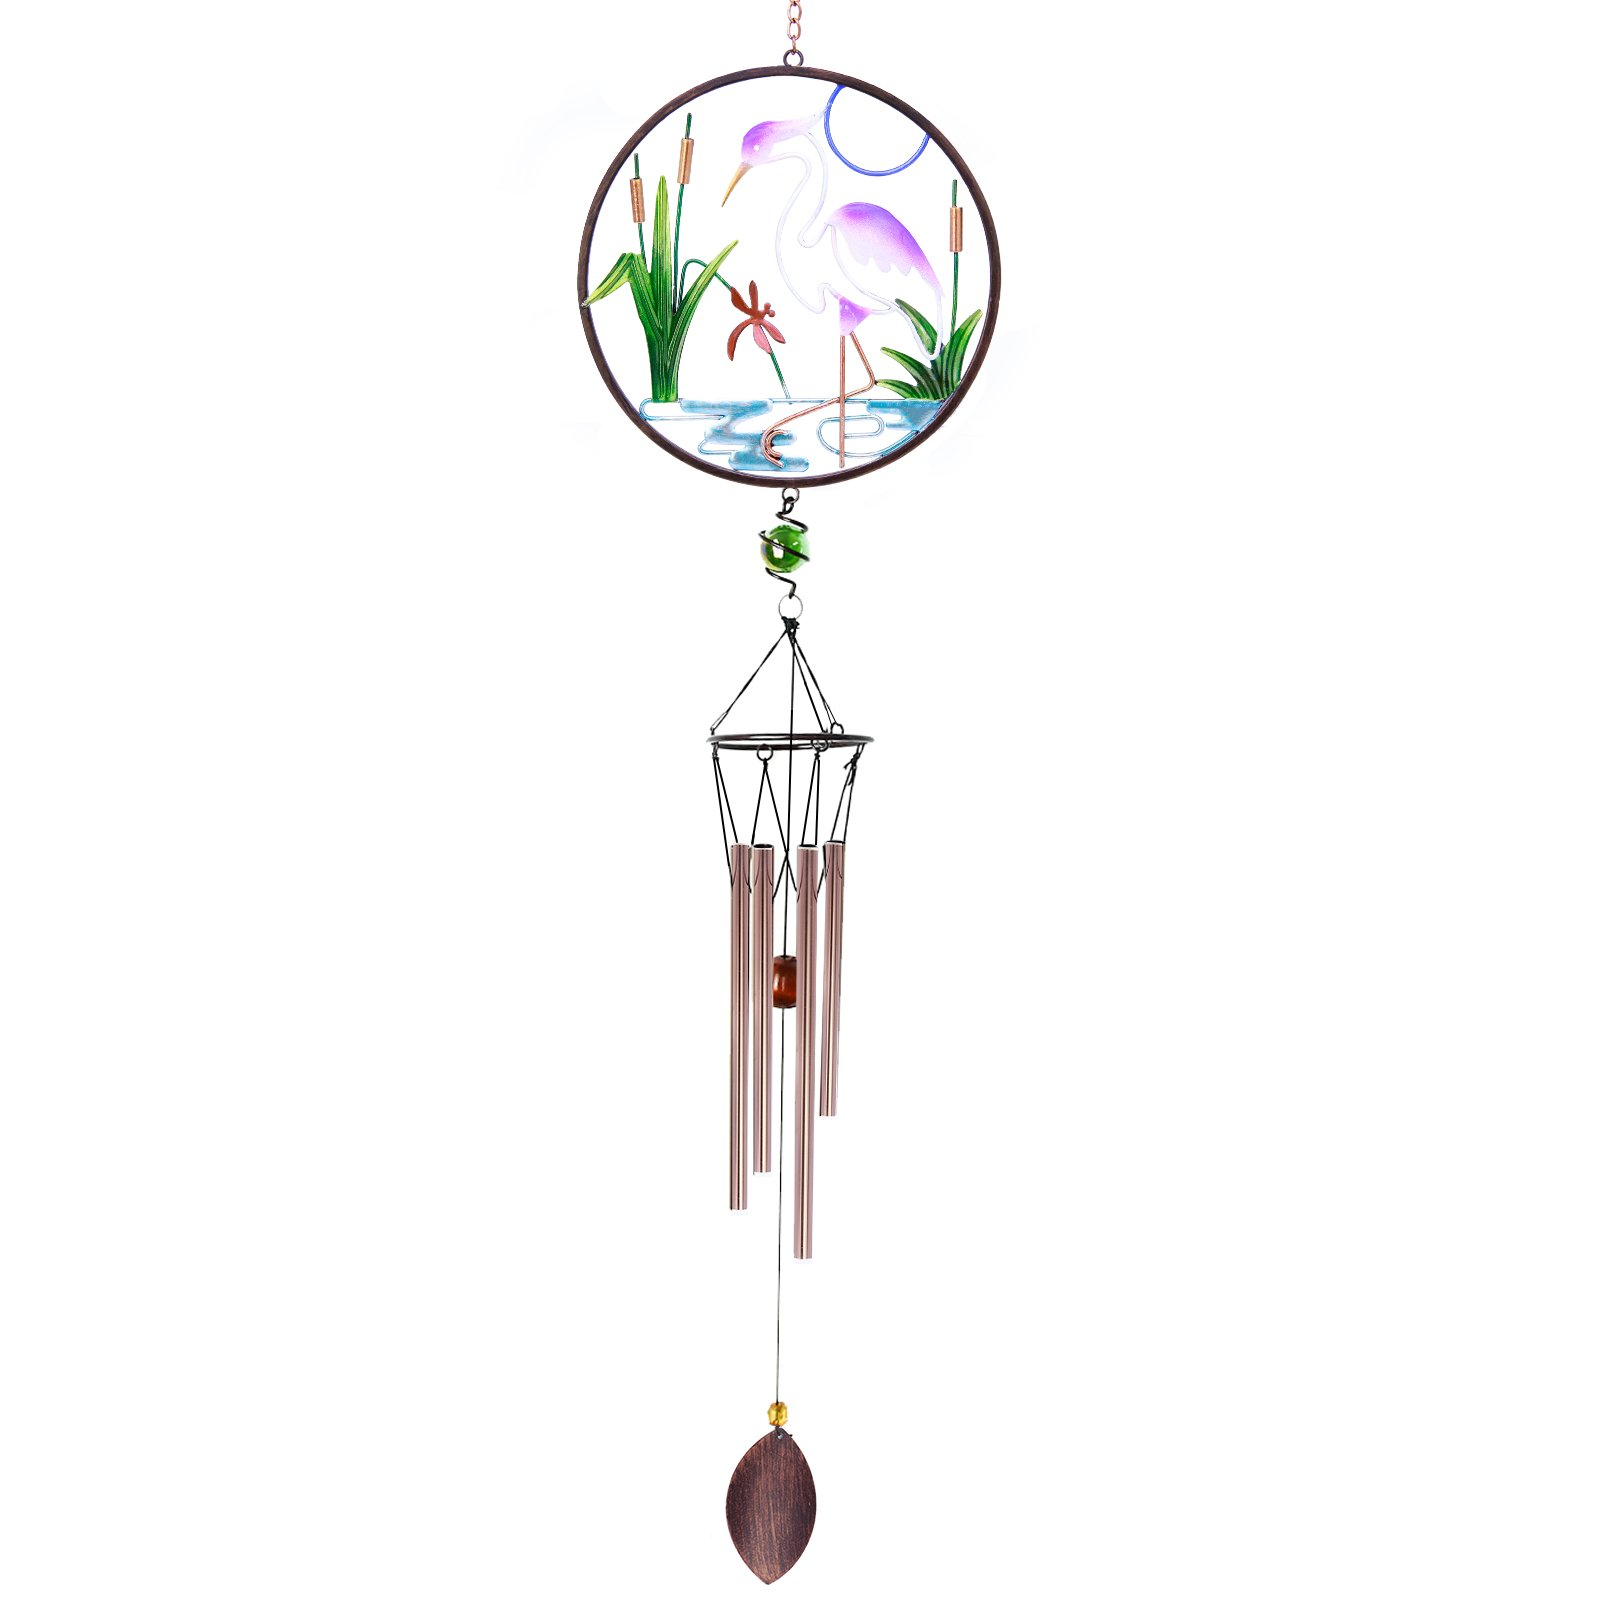 CREATIVE DESIGN CD-WC02, 32''H White Crane Wind Chimes, Portable Metal Garden Home Garden Decoration